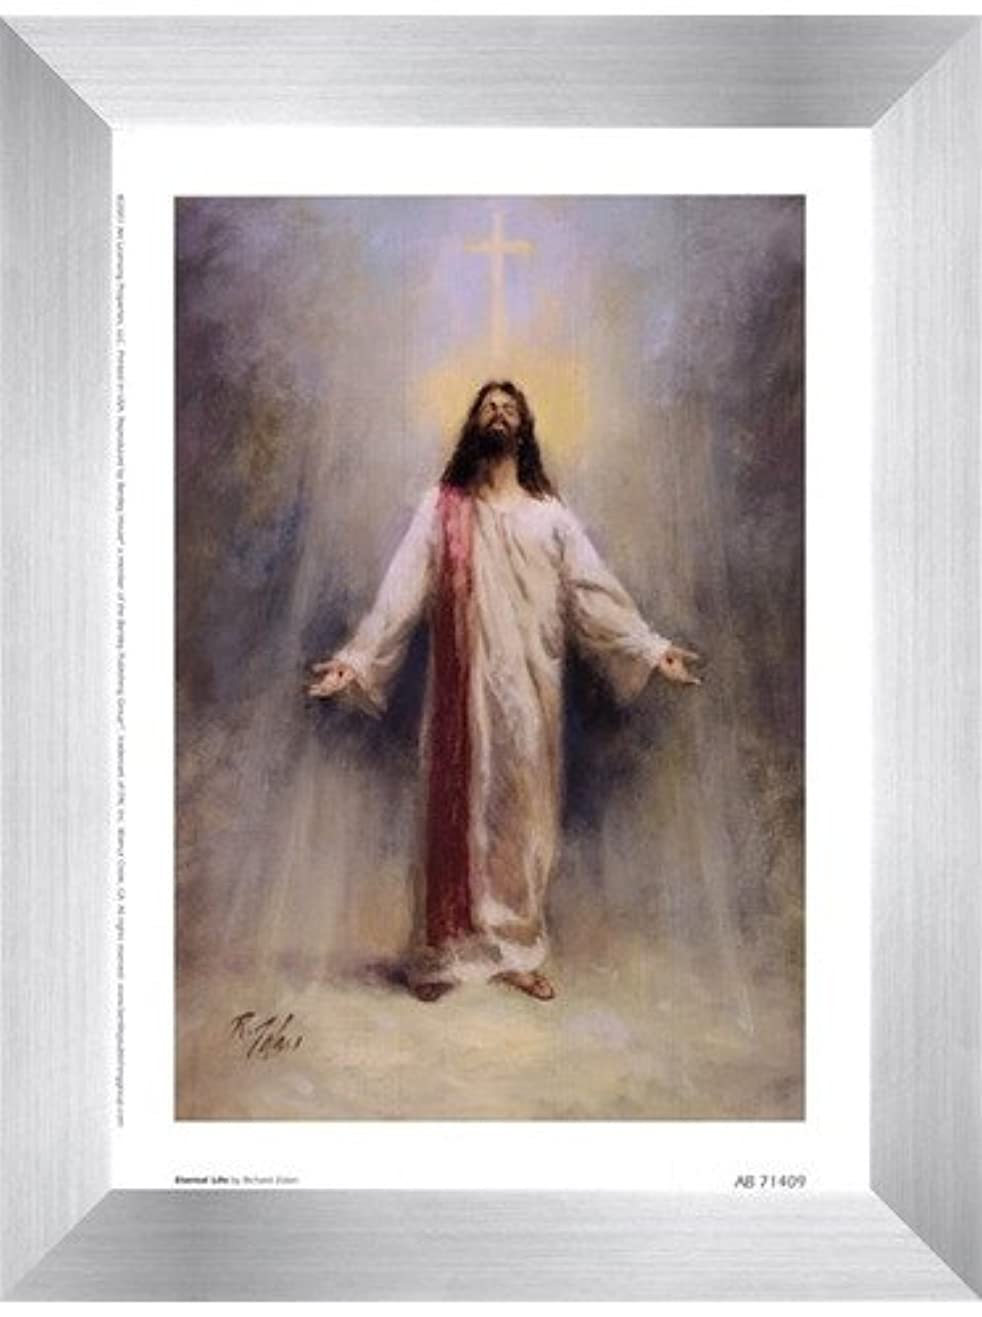 Eternal Life by Richard Judson Zolan – 6 x 8インチ – アートプリントポスター LE_48554-F9935-6x8